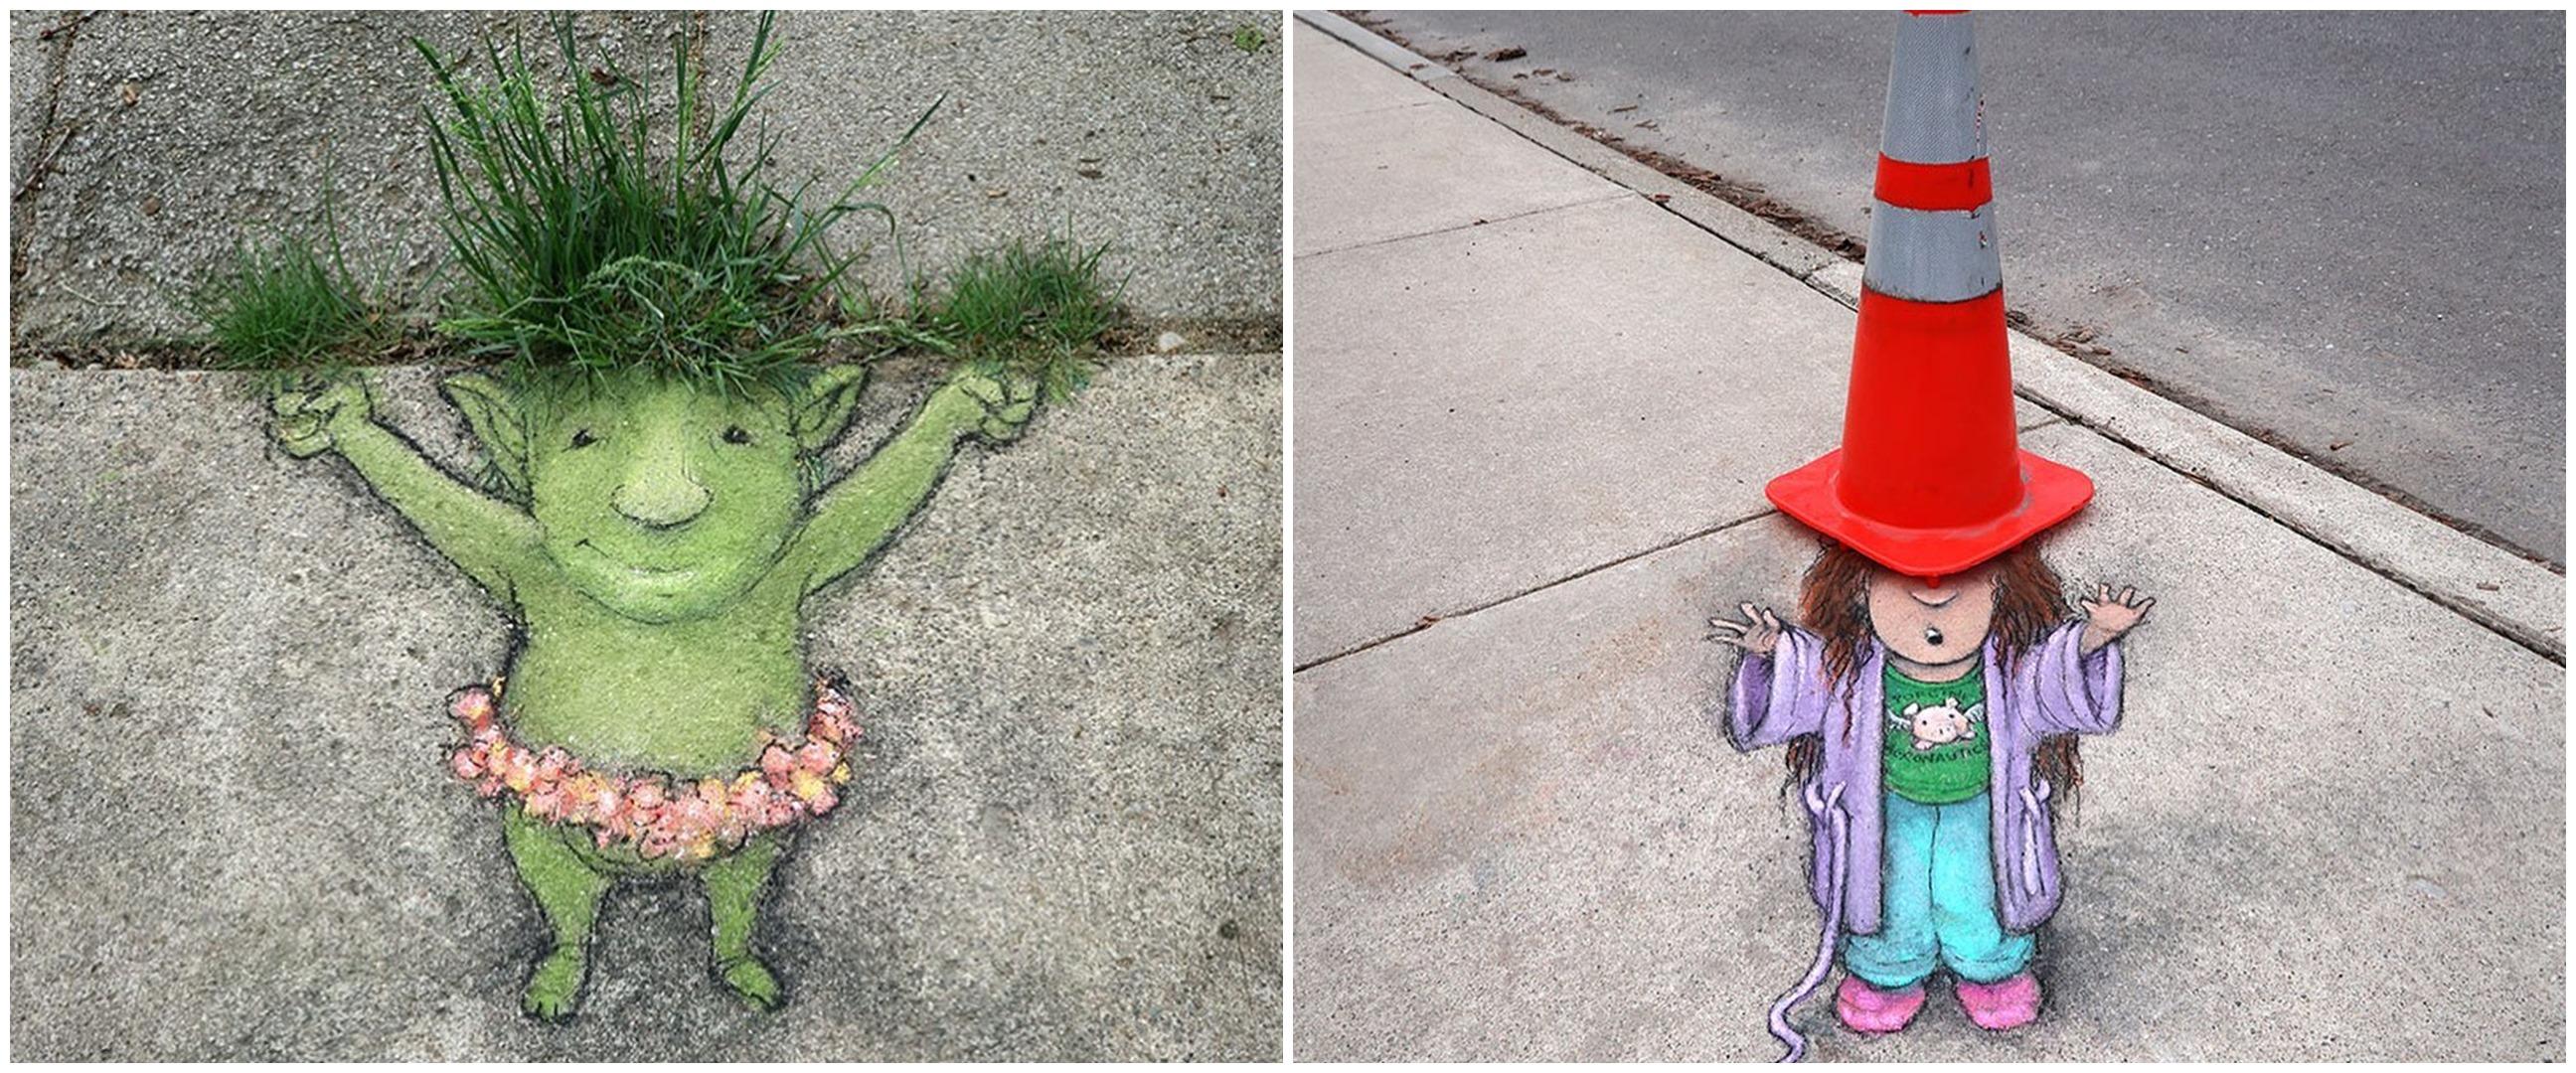 Benda jalanan jadi karya seni, 10 potretnya seperti 3D